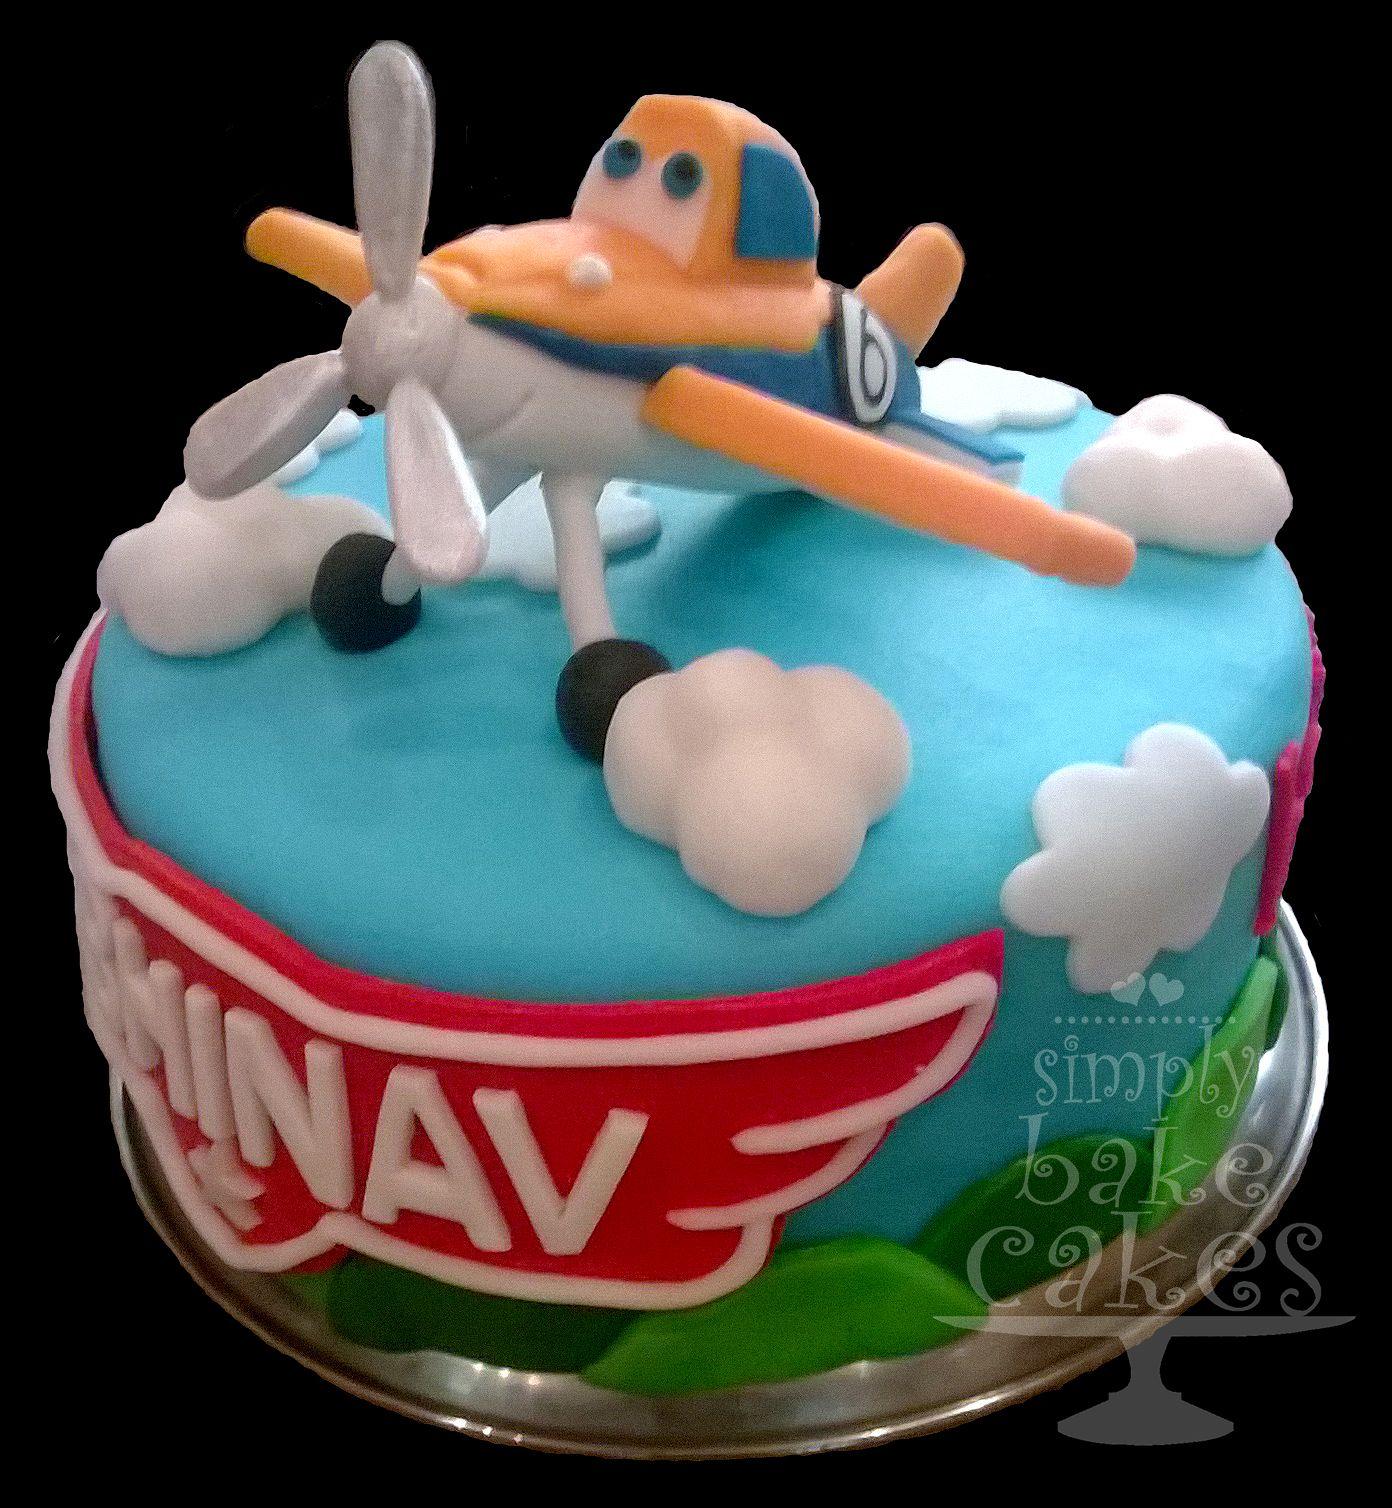 Disneys Planes Dusty Crophopper Birthday Cake Tutorial Http